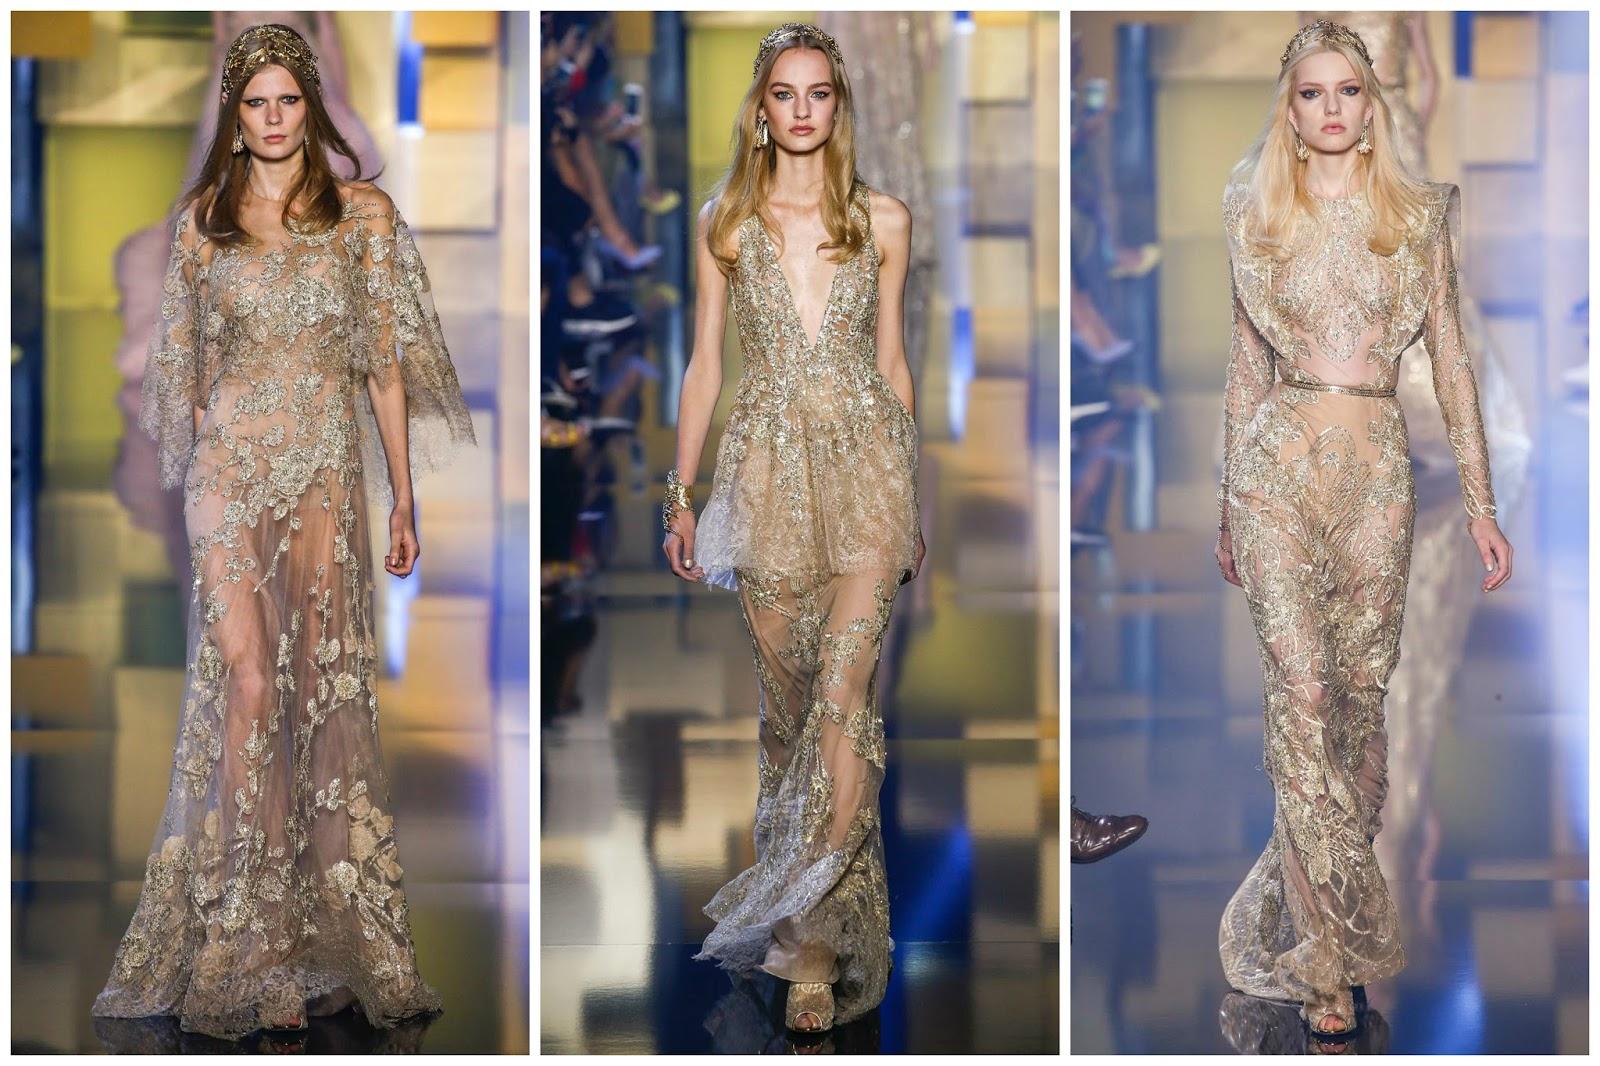 Elie Saab Show 2015 dress